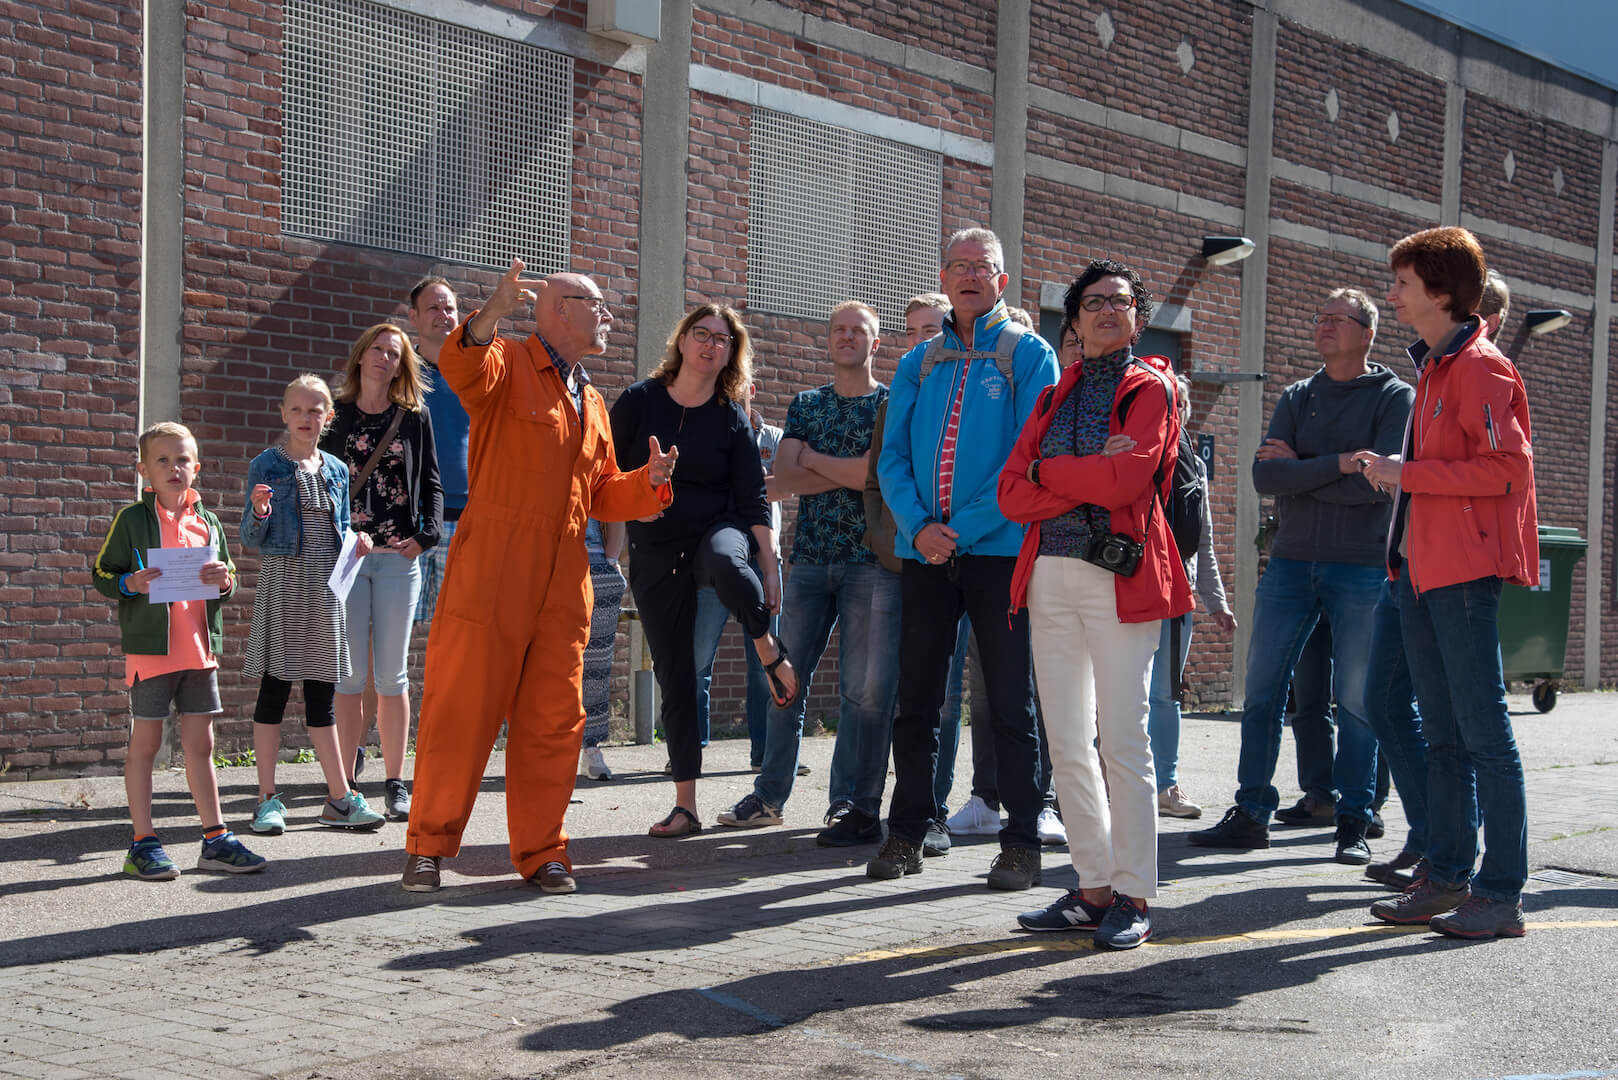 Rondleiding Koepelgevangenis Breda